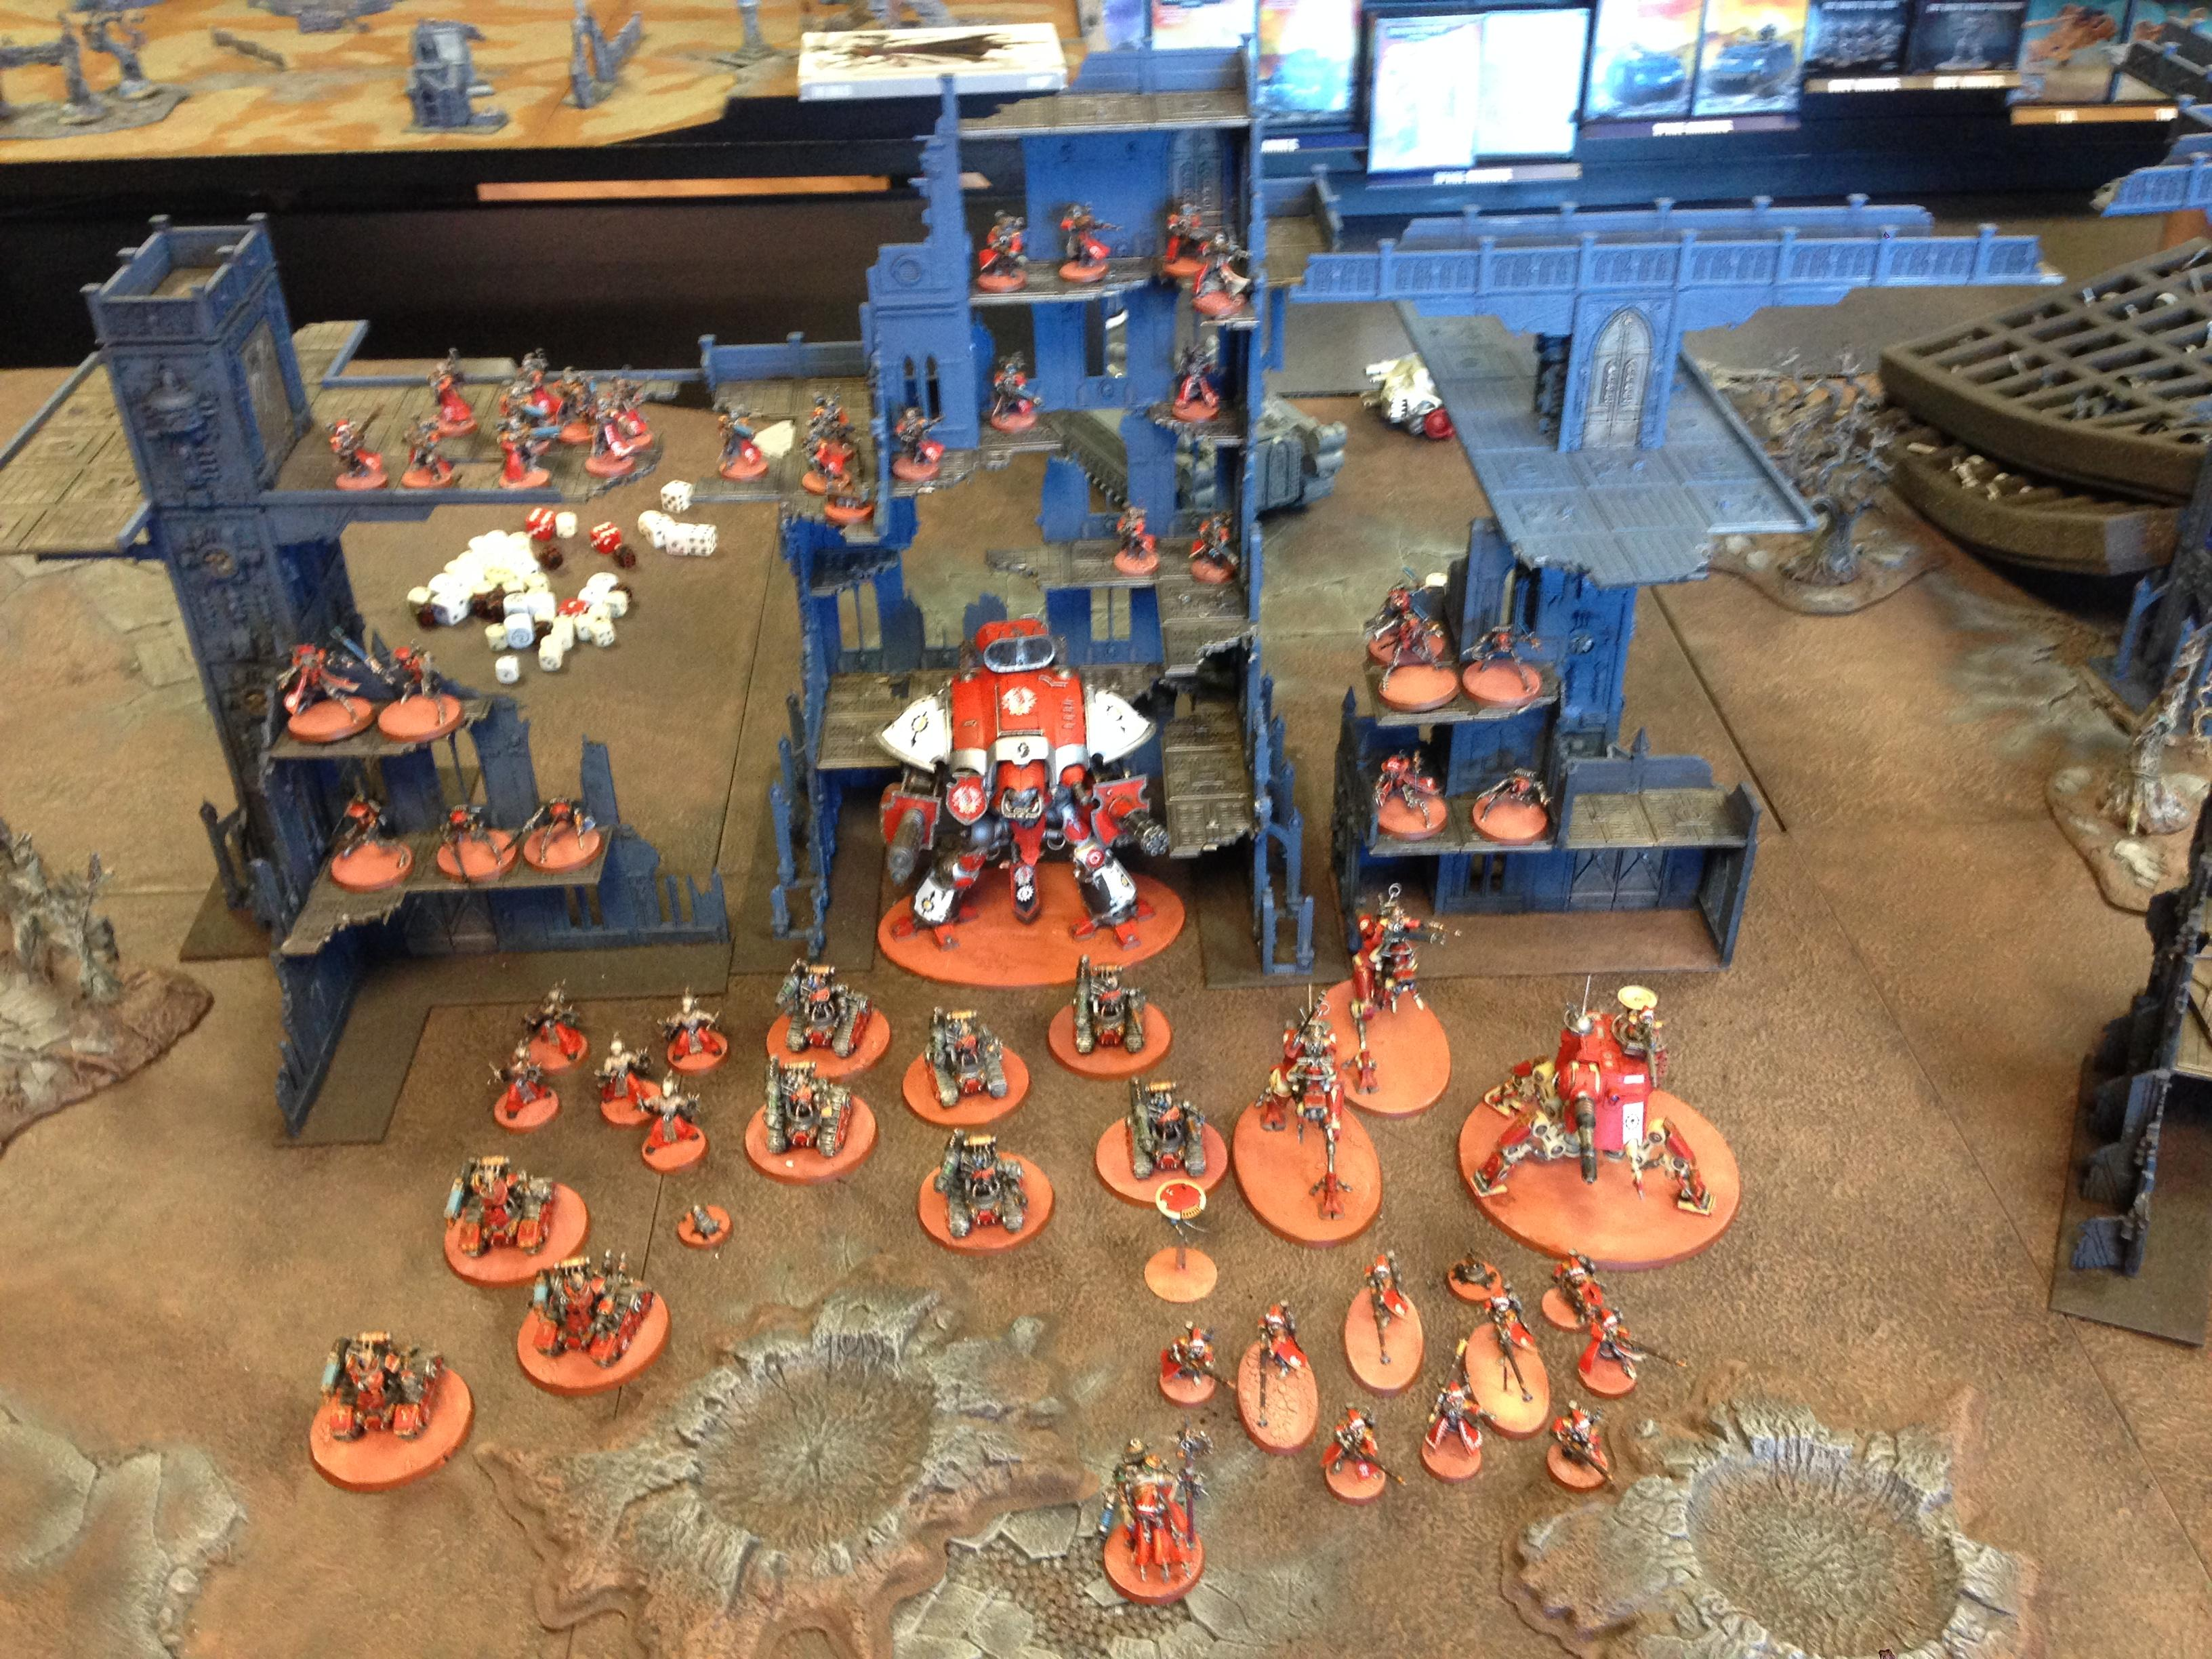 Admech, Army, Imperial Knight, Mars, Shot, Skitarii, Victory, Warhammer 40,000